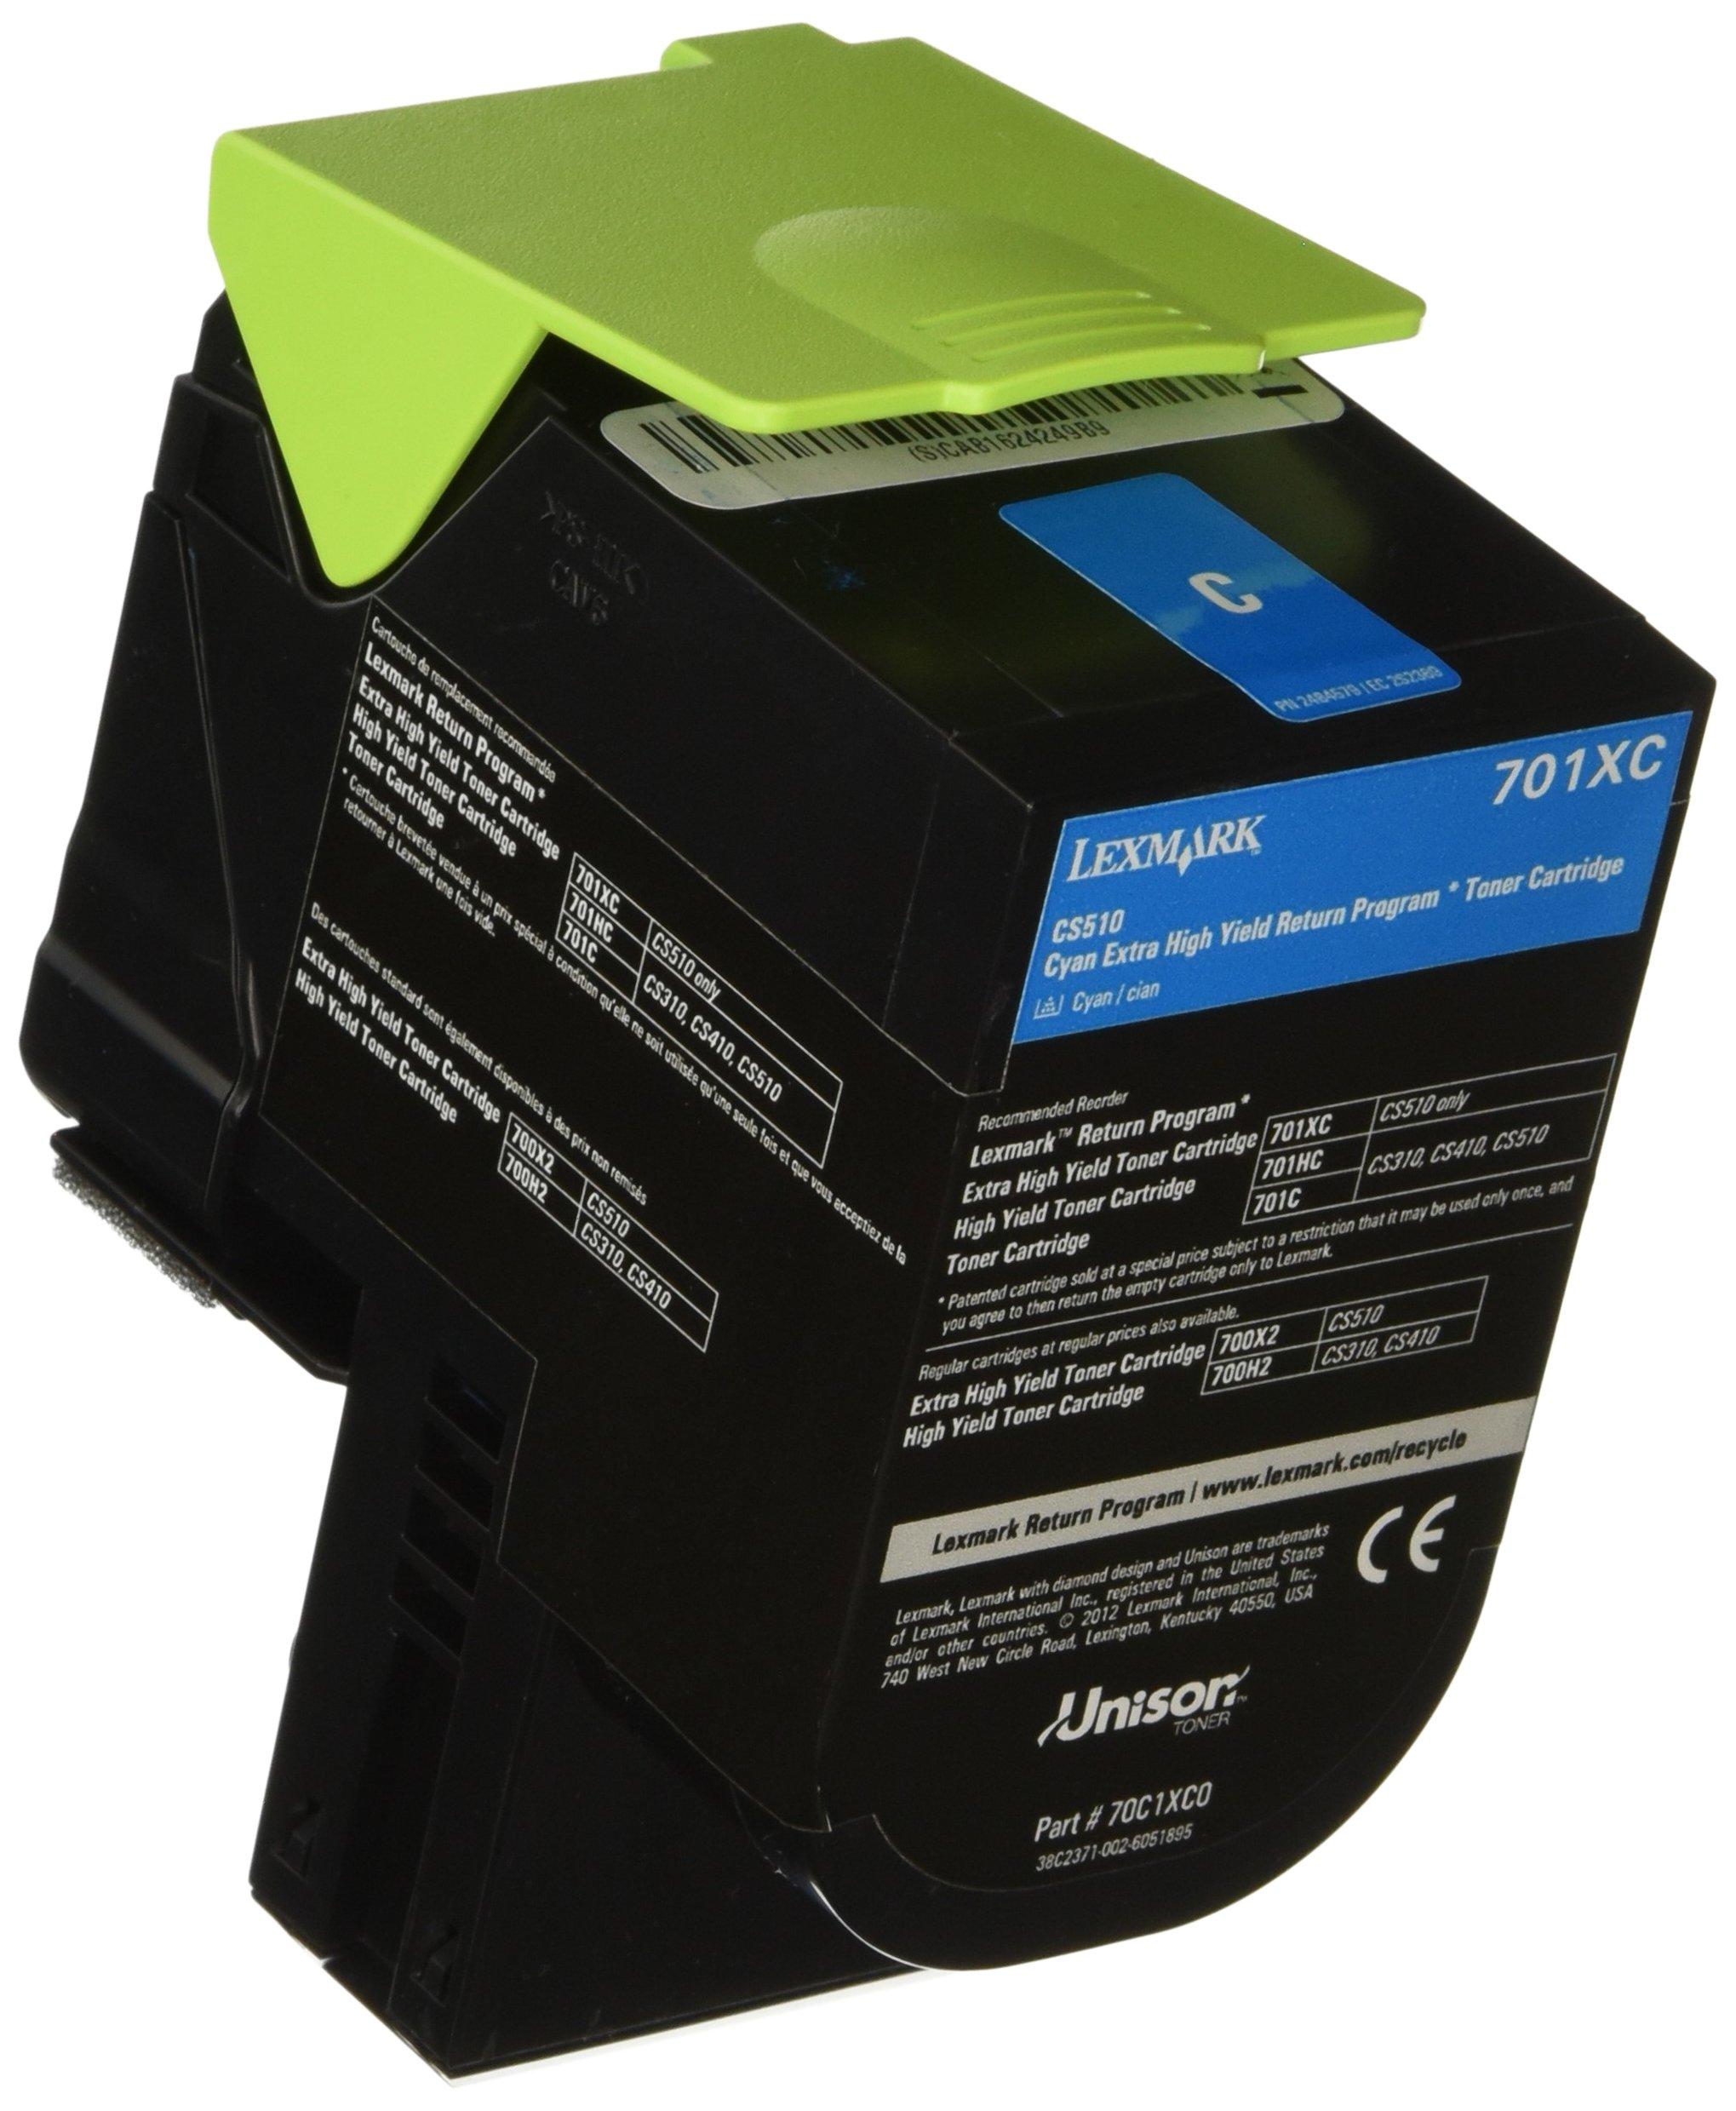 Toner Alternativo ( X1 ) Alta Capacidad Cyan 70C1XC0 4000-Paginas